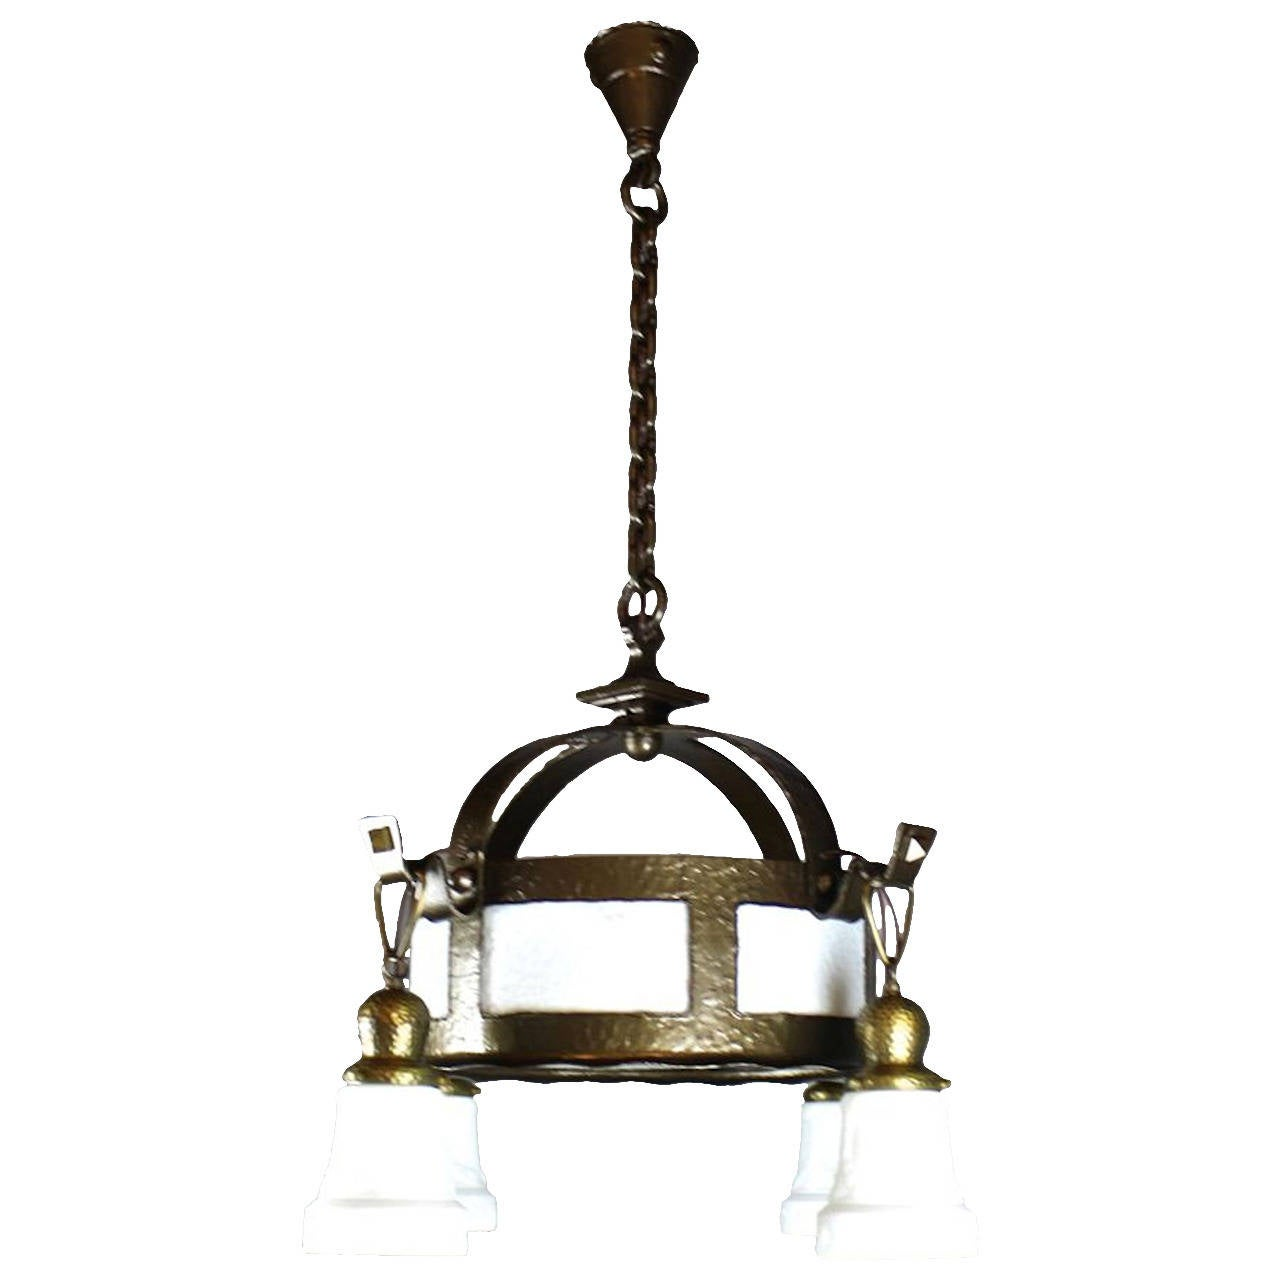 arts and crafts hand hammered fixture 4 light for sale. Black Bedroom Furniture Sets. Home Design Ideas